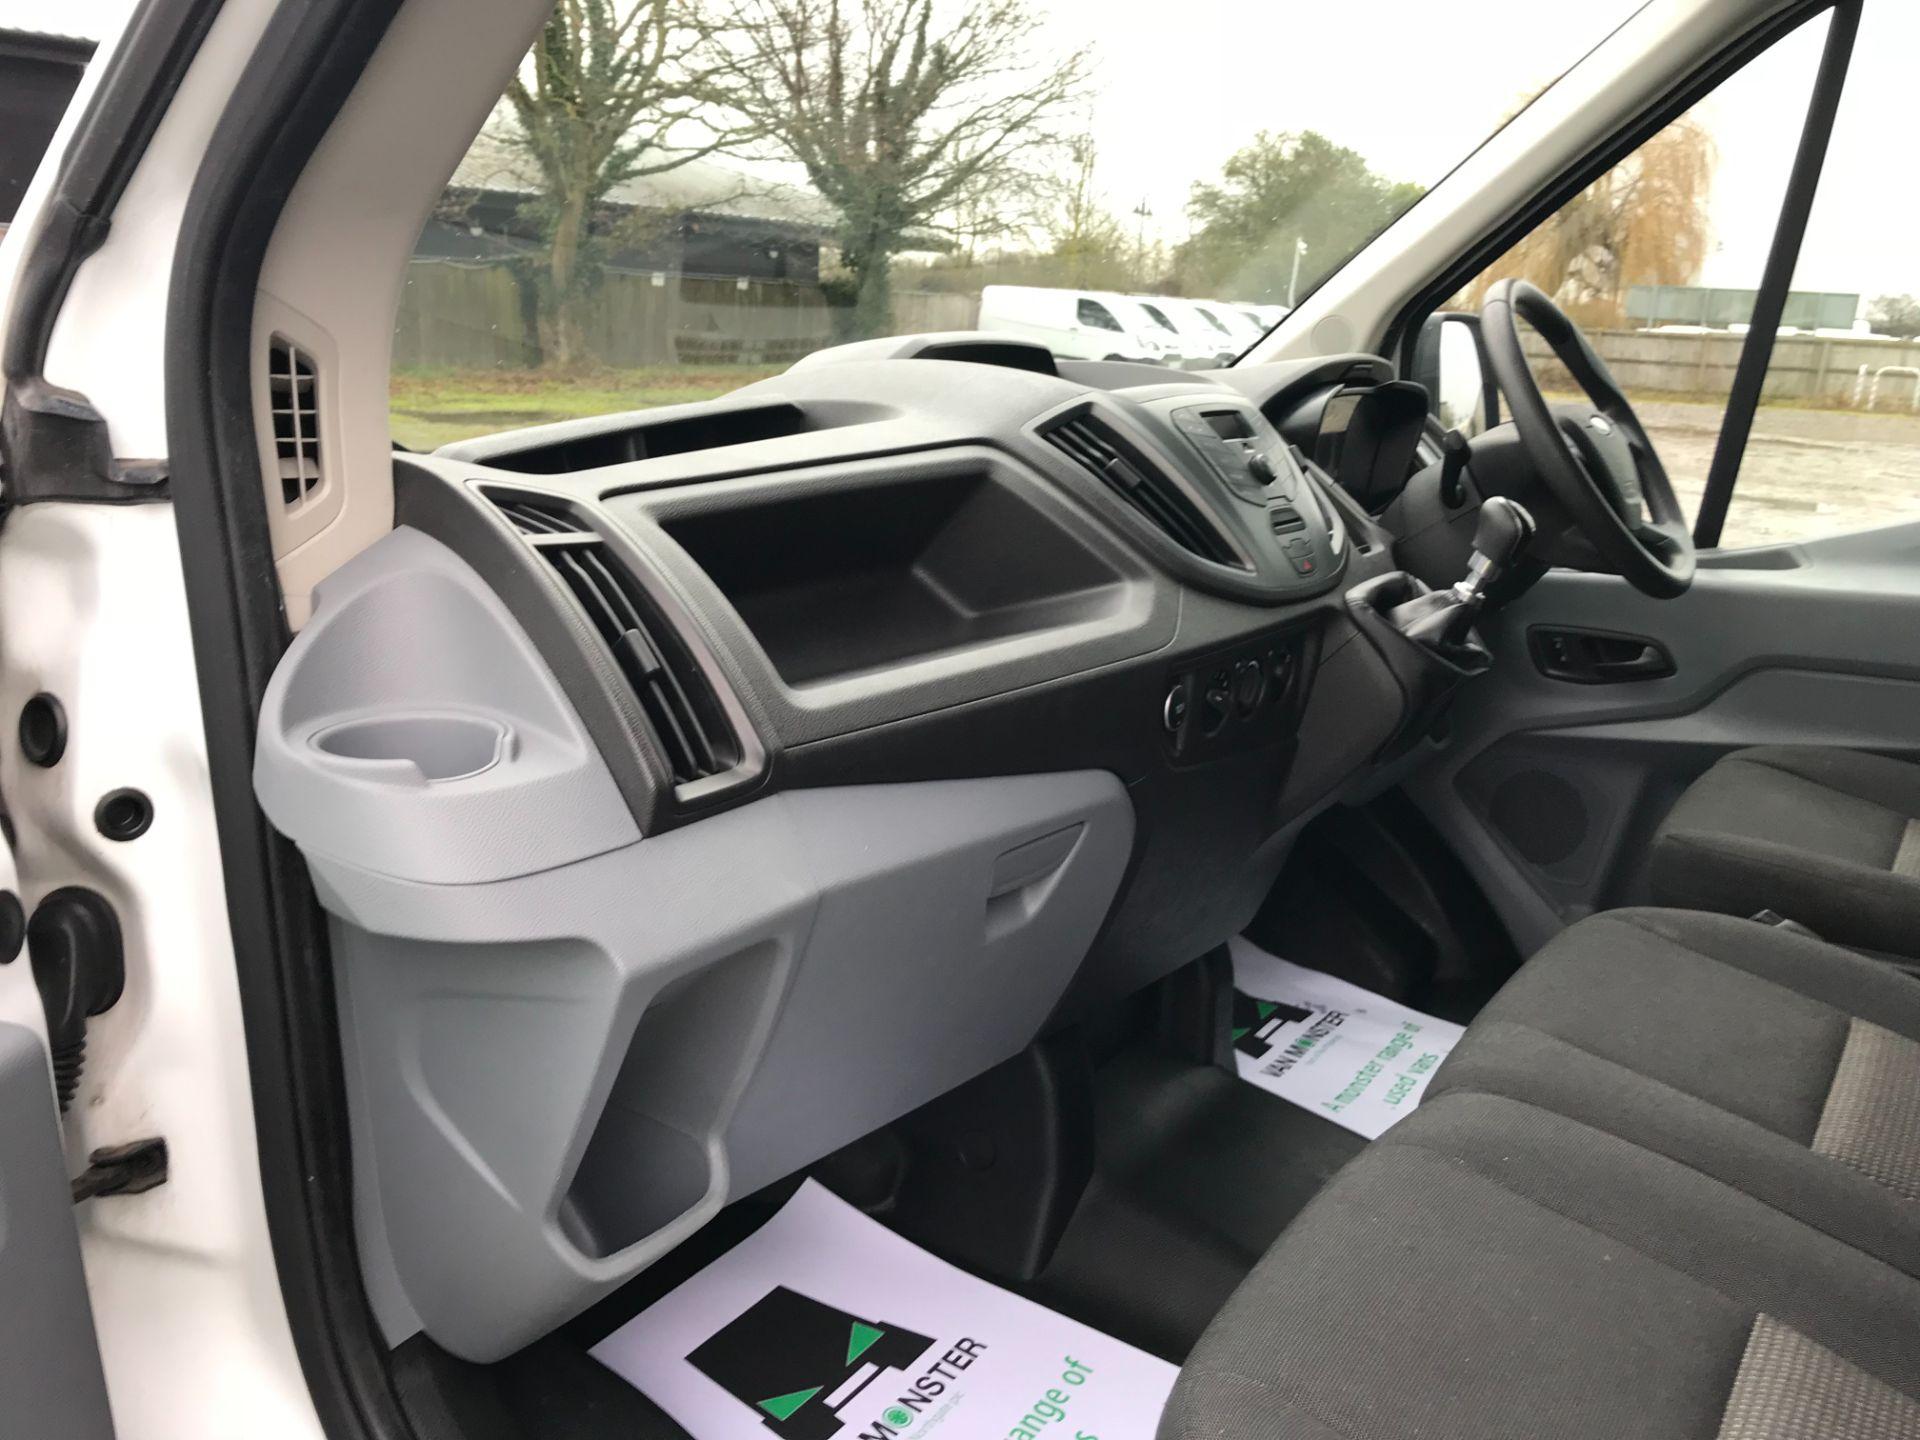 2018 Ford Transit 2.0 Tdci 130 L2 H2 EURO 6 (FG18YJM) Image 23